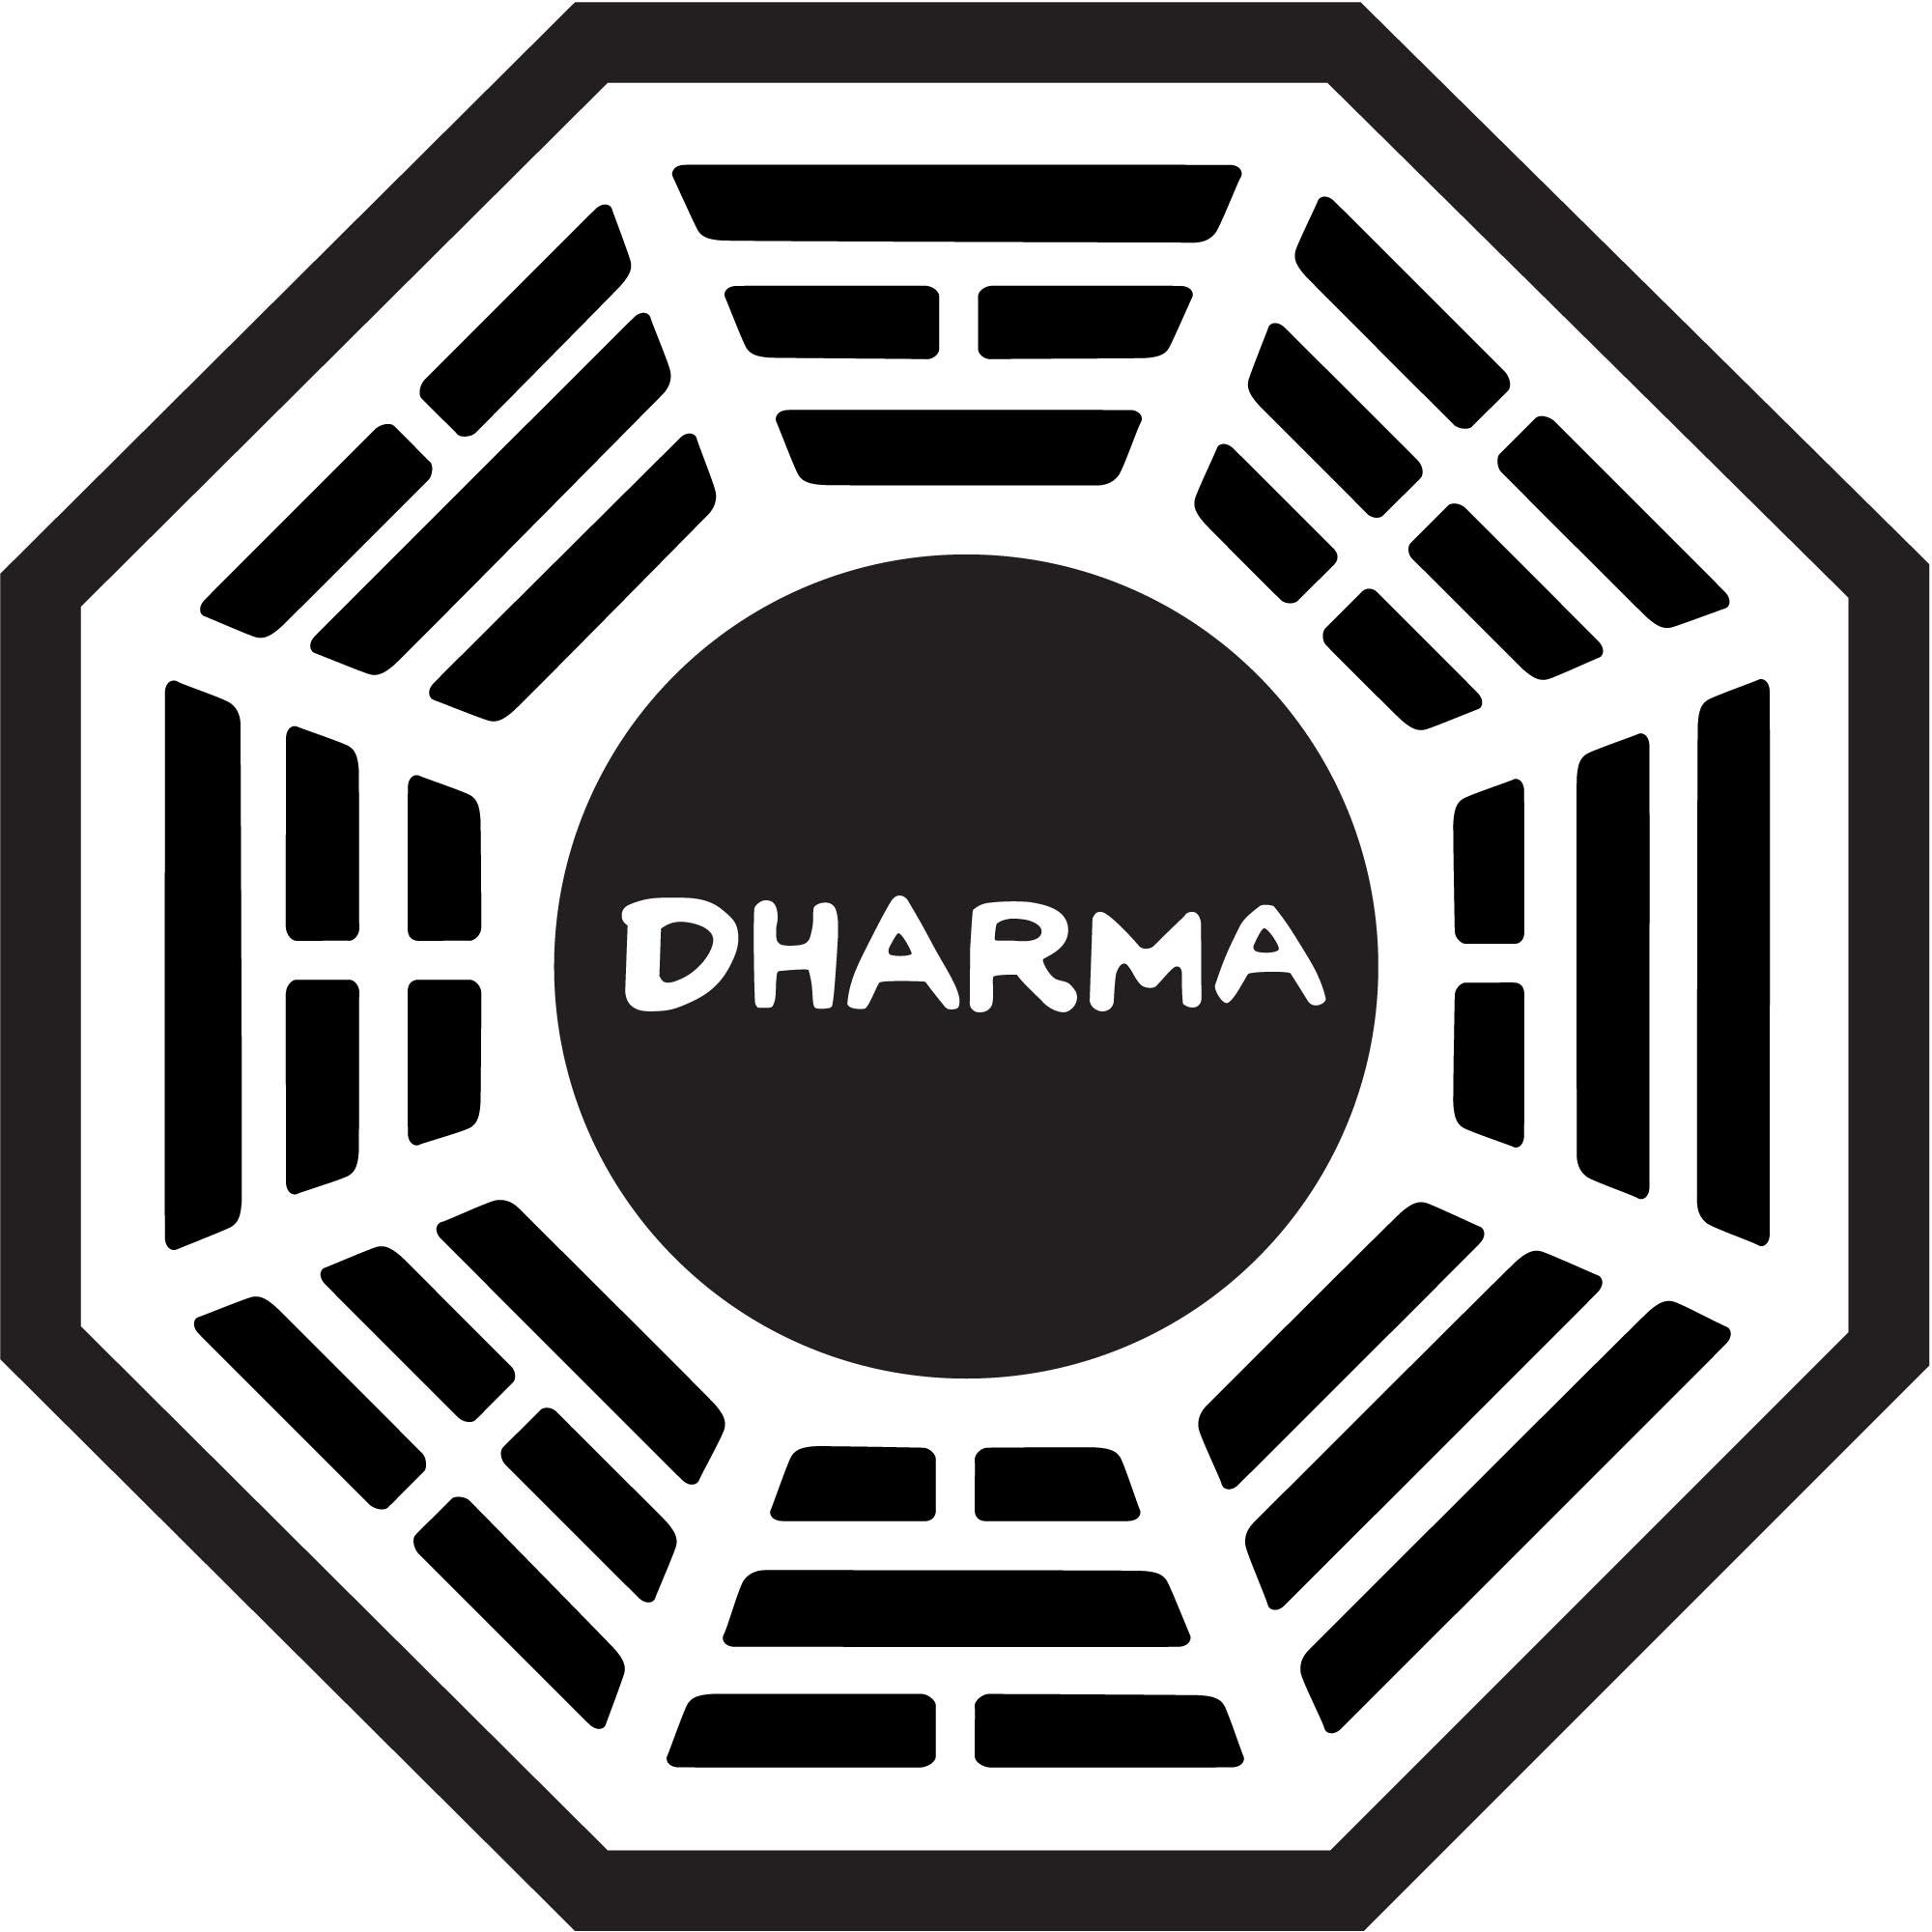 Dharma clipart Dharma 400x389px 4 Dharma #220736